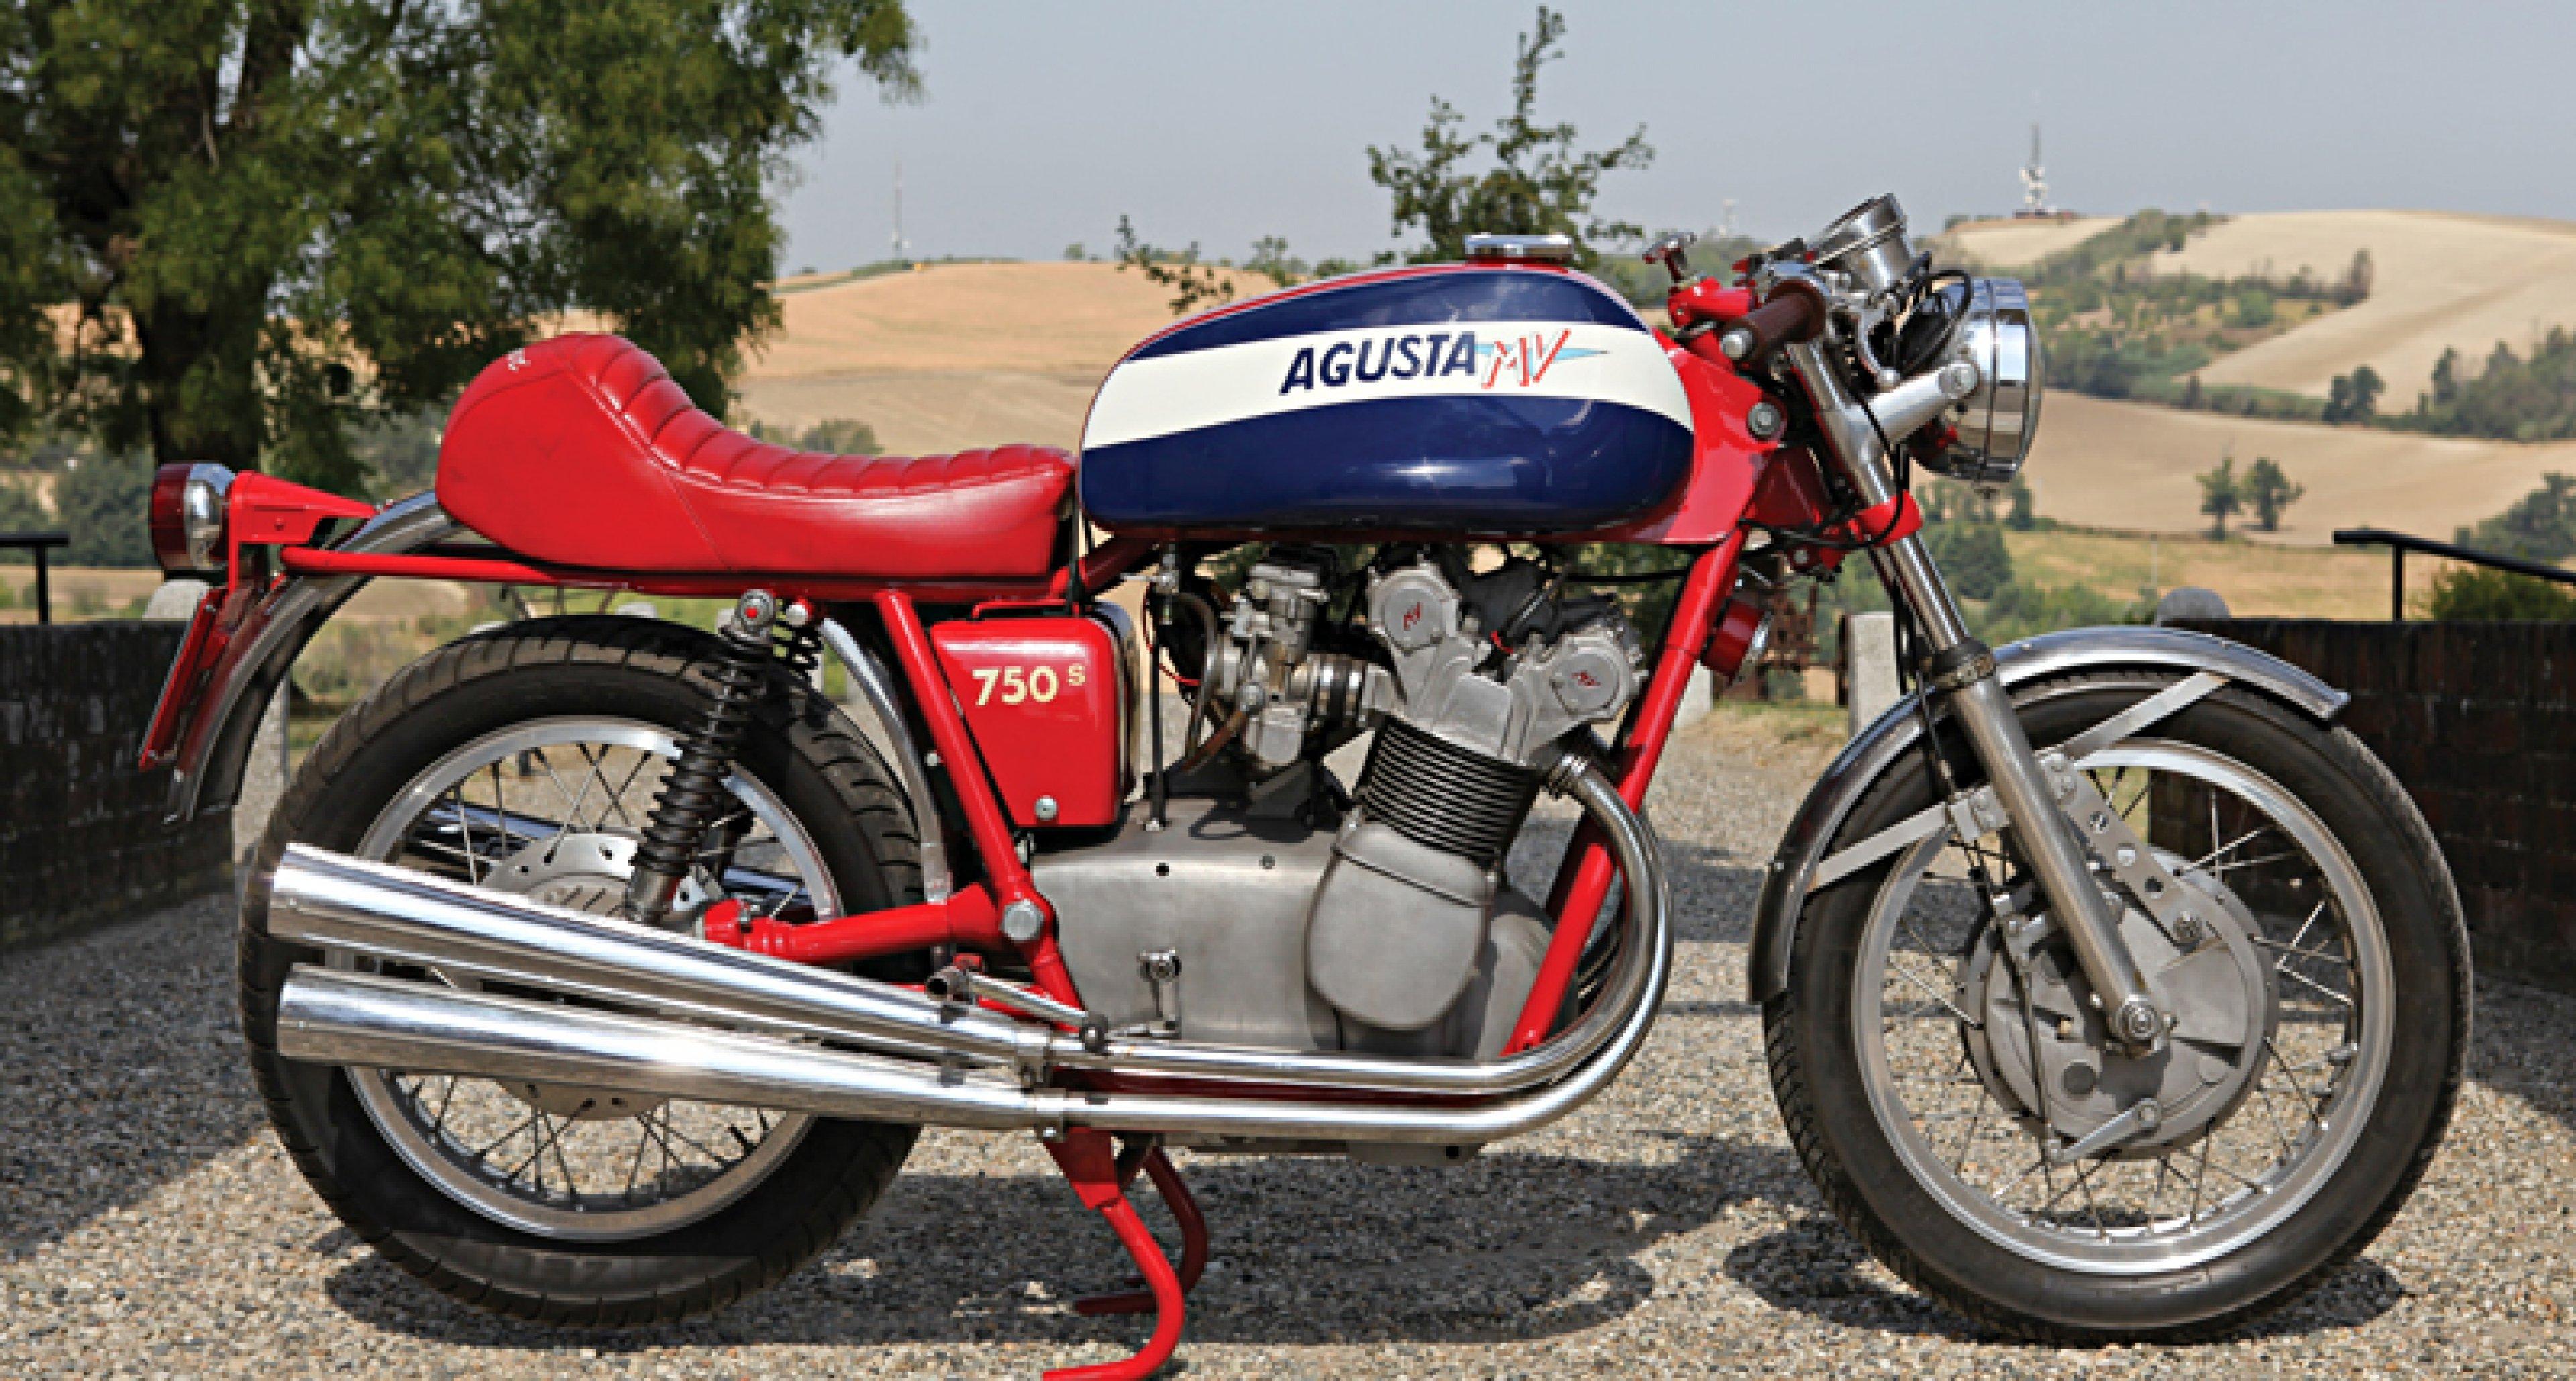 RM versteigert Italo-Bike-Ikonen: Die wilden Siebziger